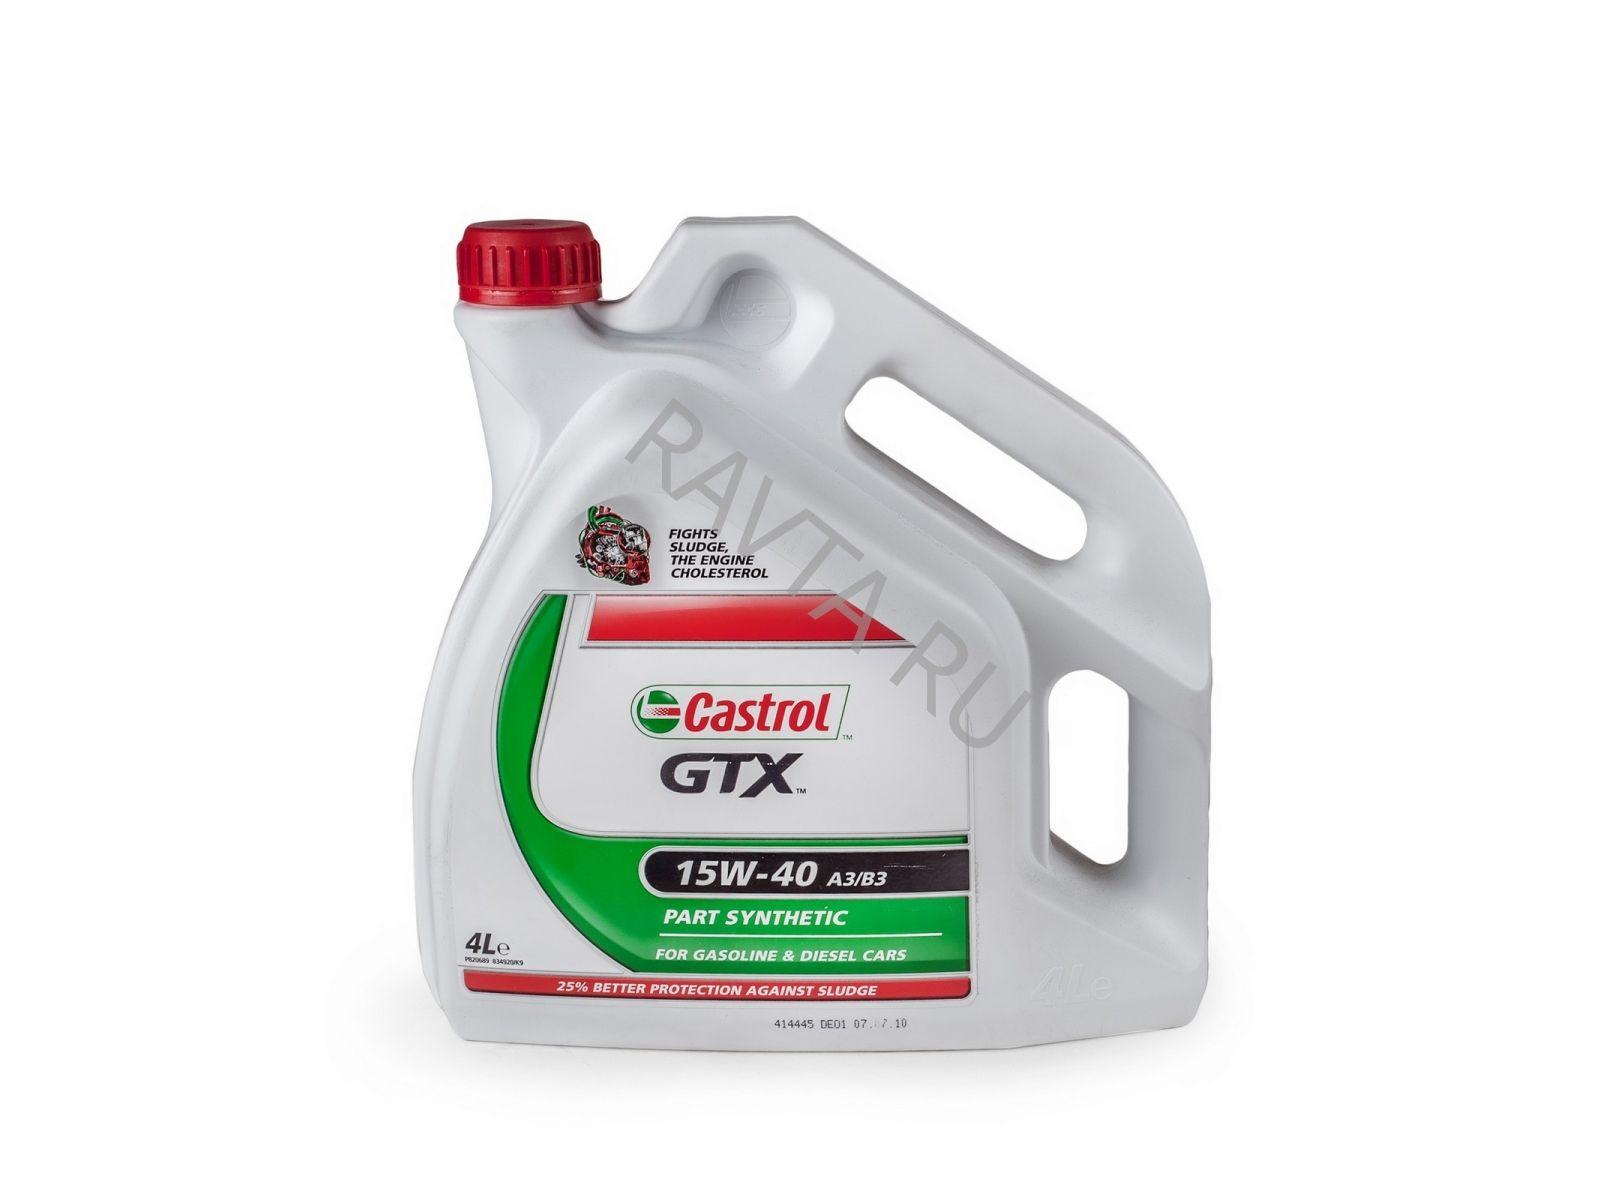 castrol Масло Castrol GTX 15W 40 А3/В3 (4л) 4 651 220 090